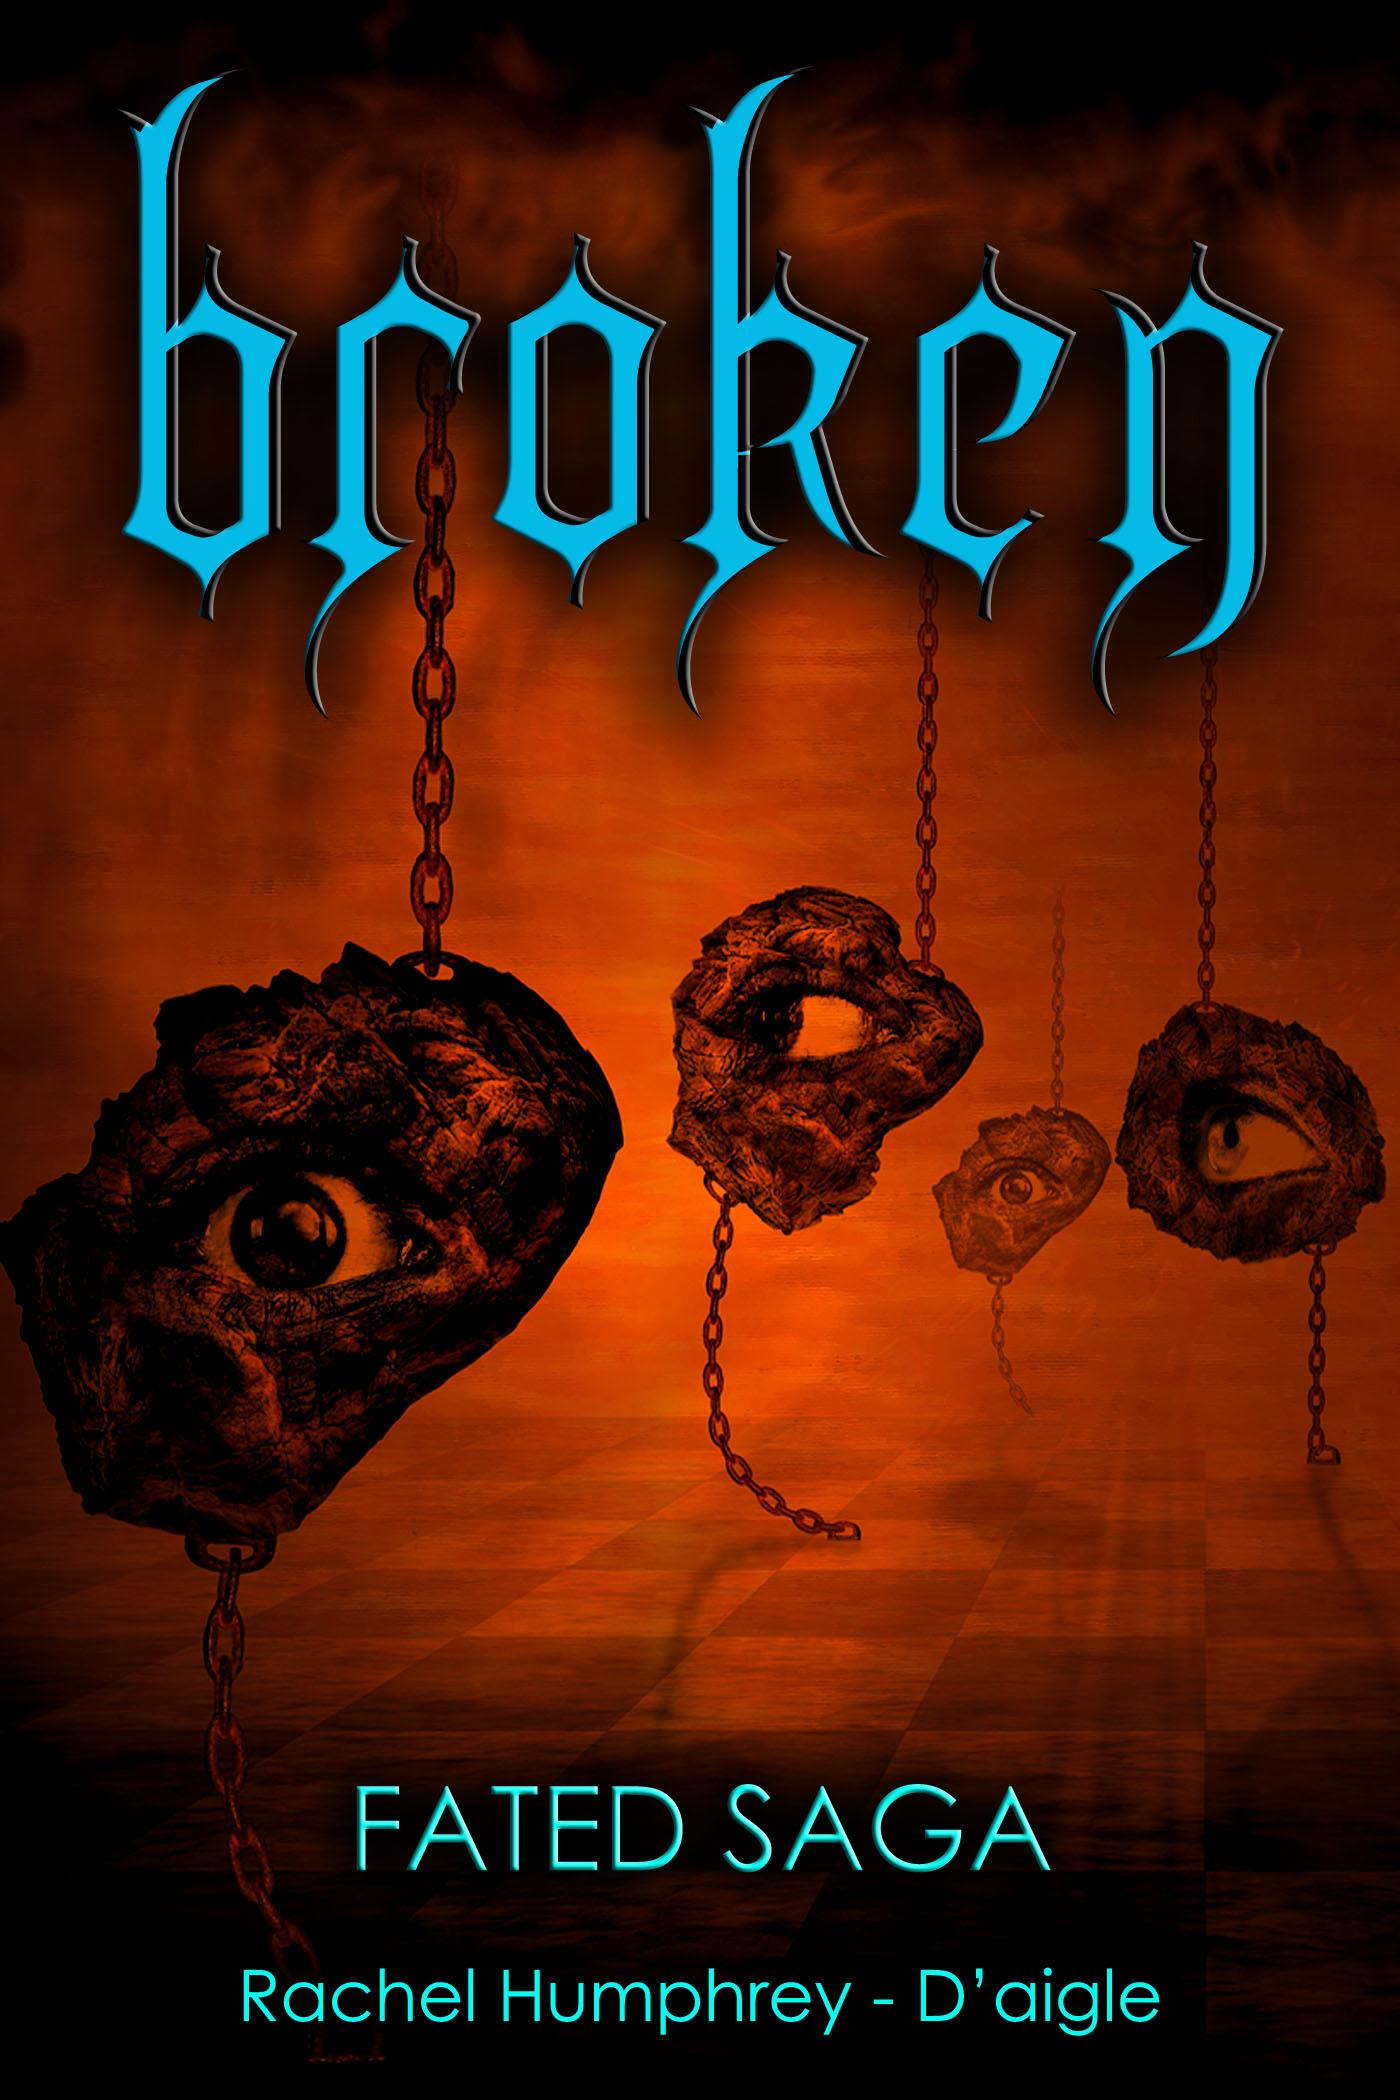 Rachel Humphrey Daigle - Broken, Book Four in the Fated Saga Fantasy Series